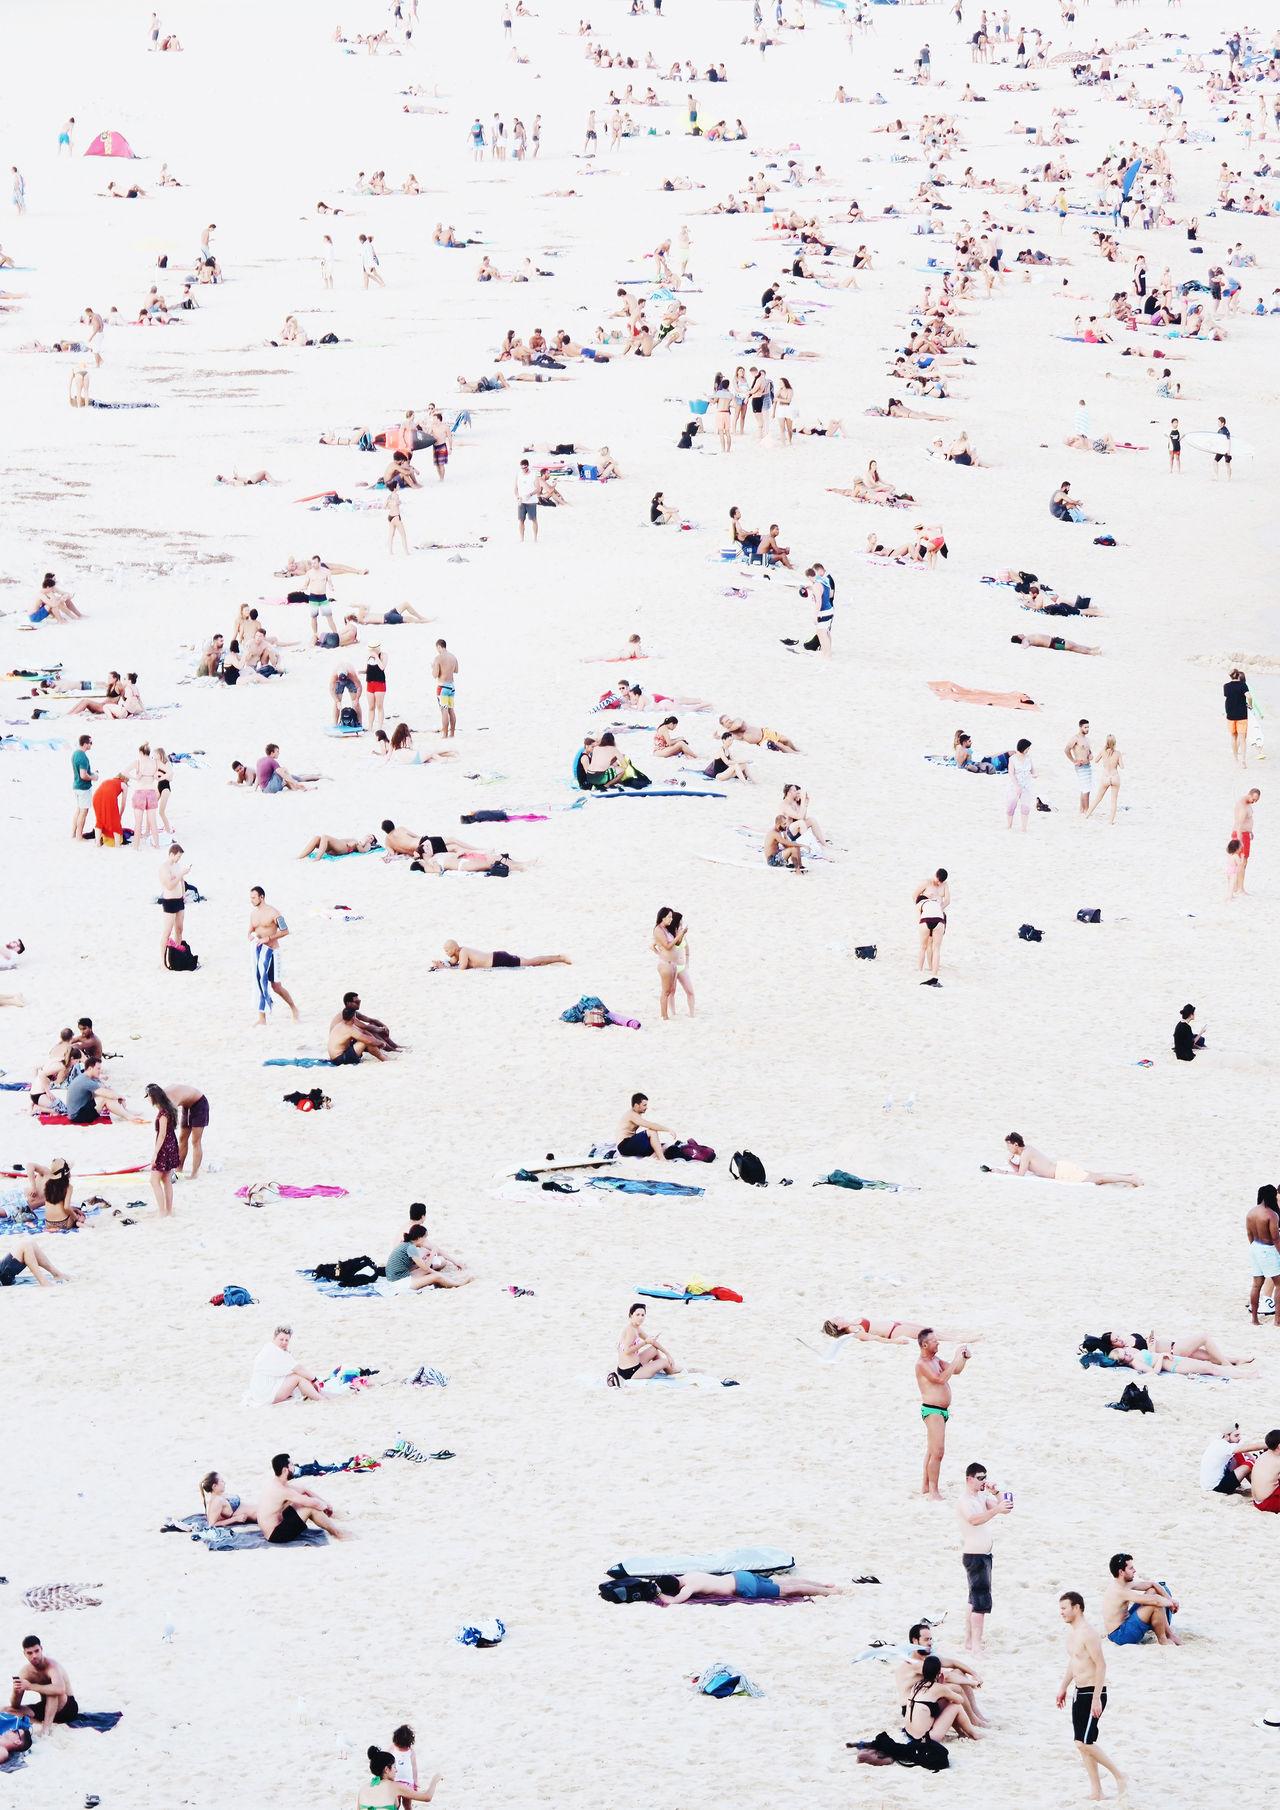 Bondi Australia beach Beach Life Beach Photography beachphotography Bondi Beach color colour landscape minimal minimalism Minimalist Olympus olympus inspired Olympus OM-D E-M1 Mark II OM-D people sand sand dune summer